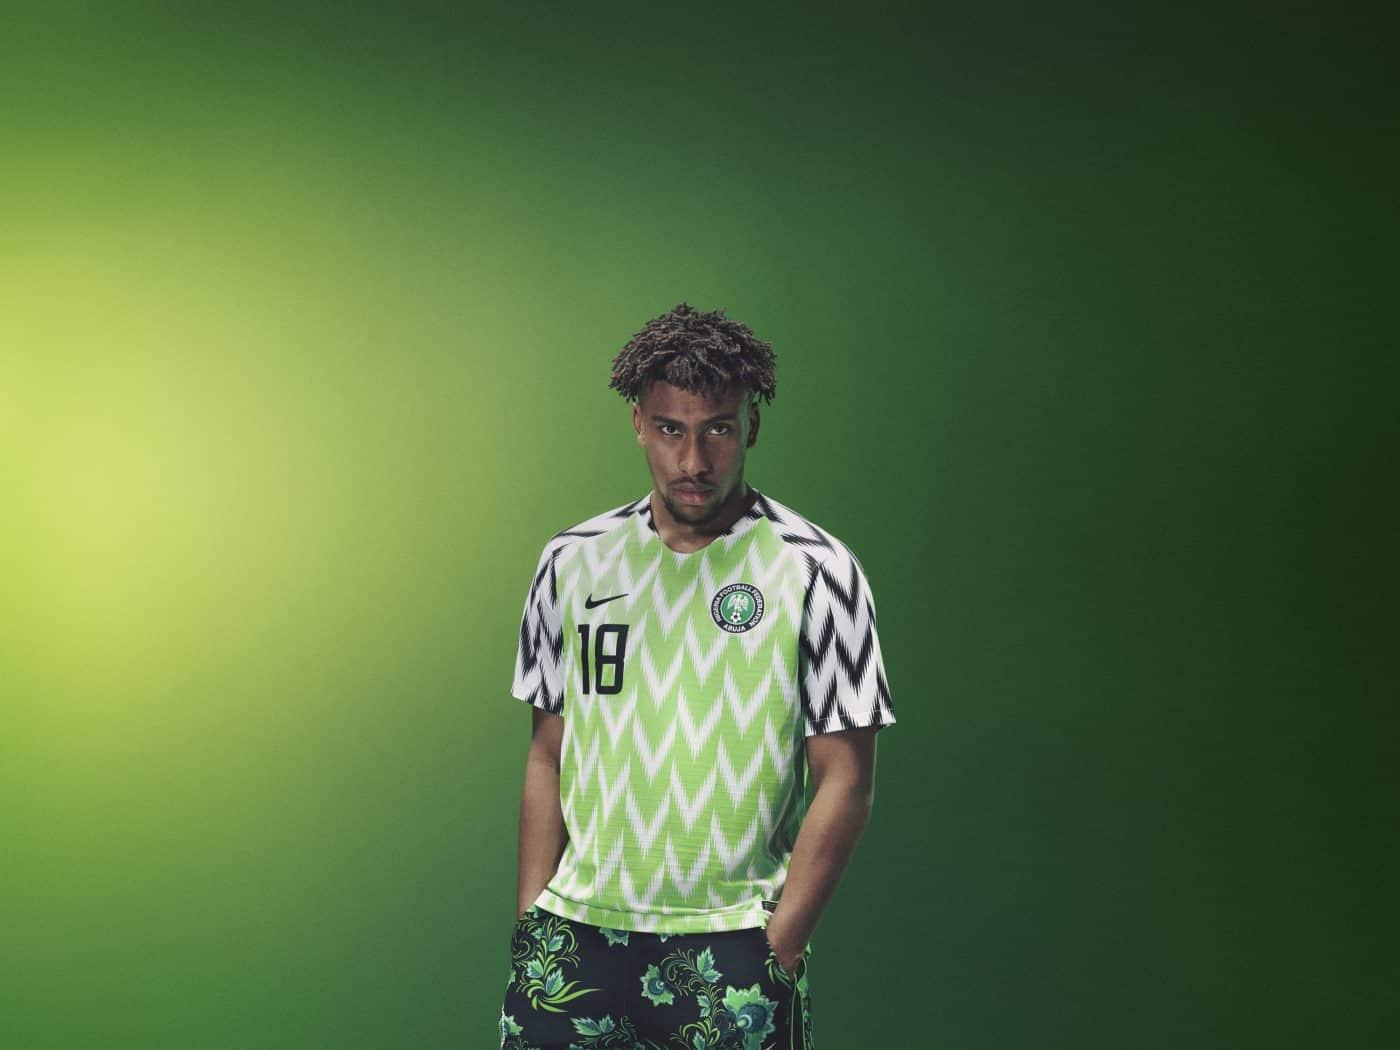 contrat-nigeria-nike-football-4